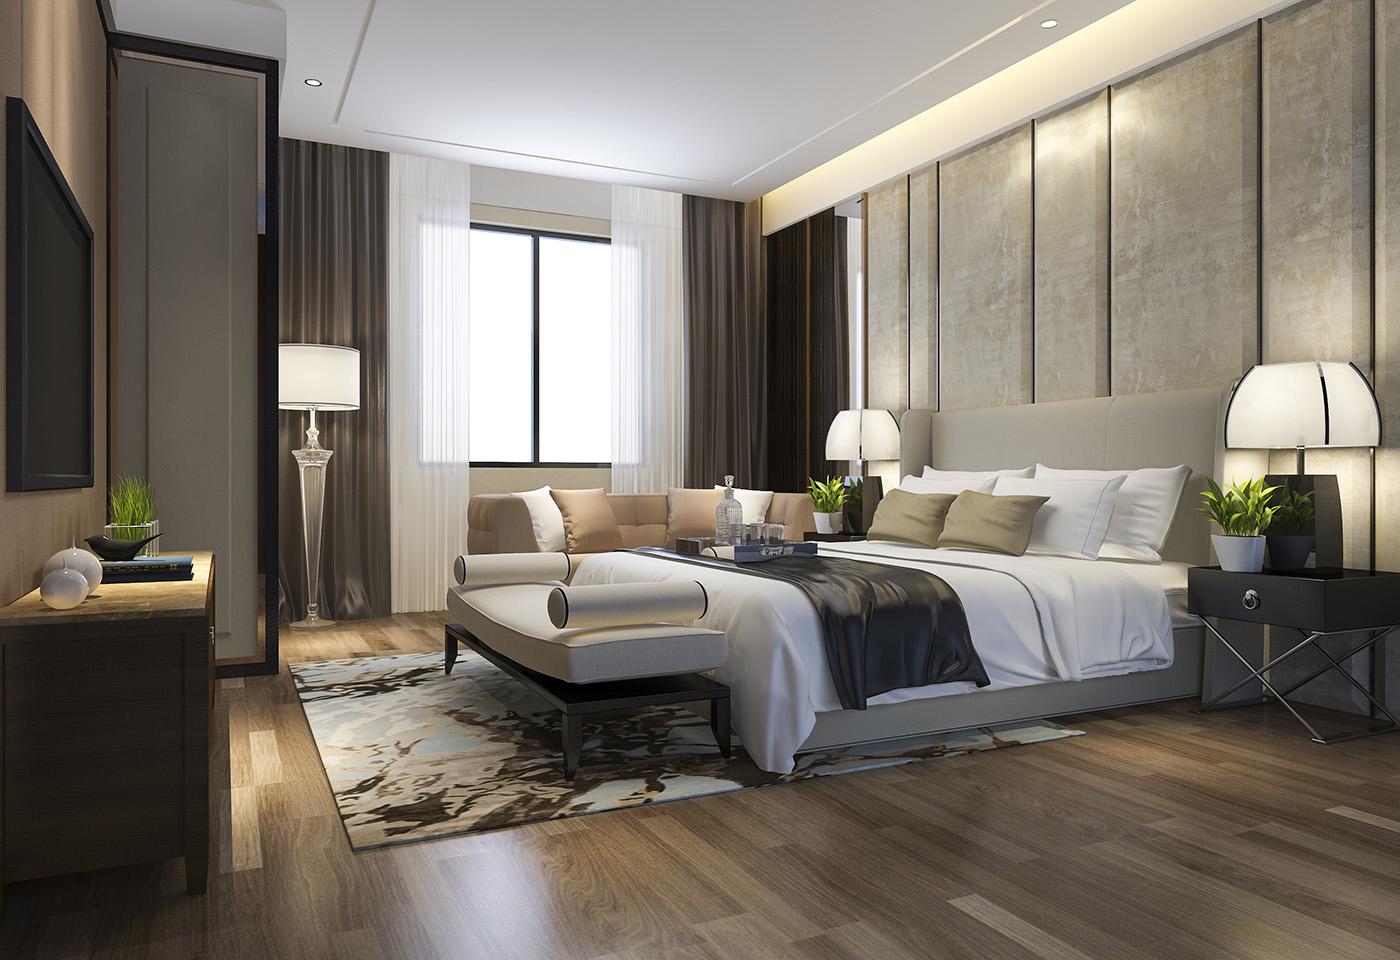 Interior Design Will Improve Your Hotel